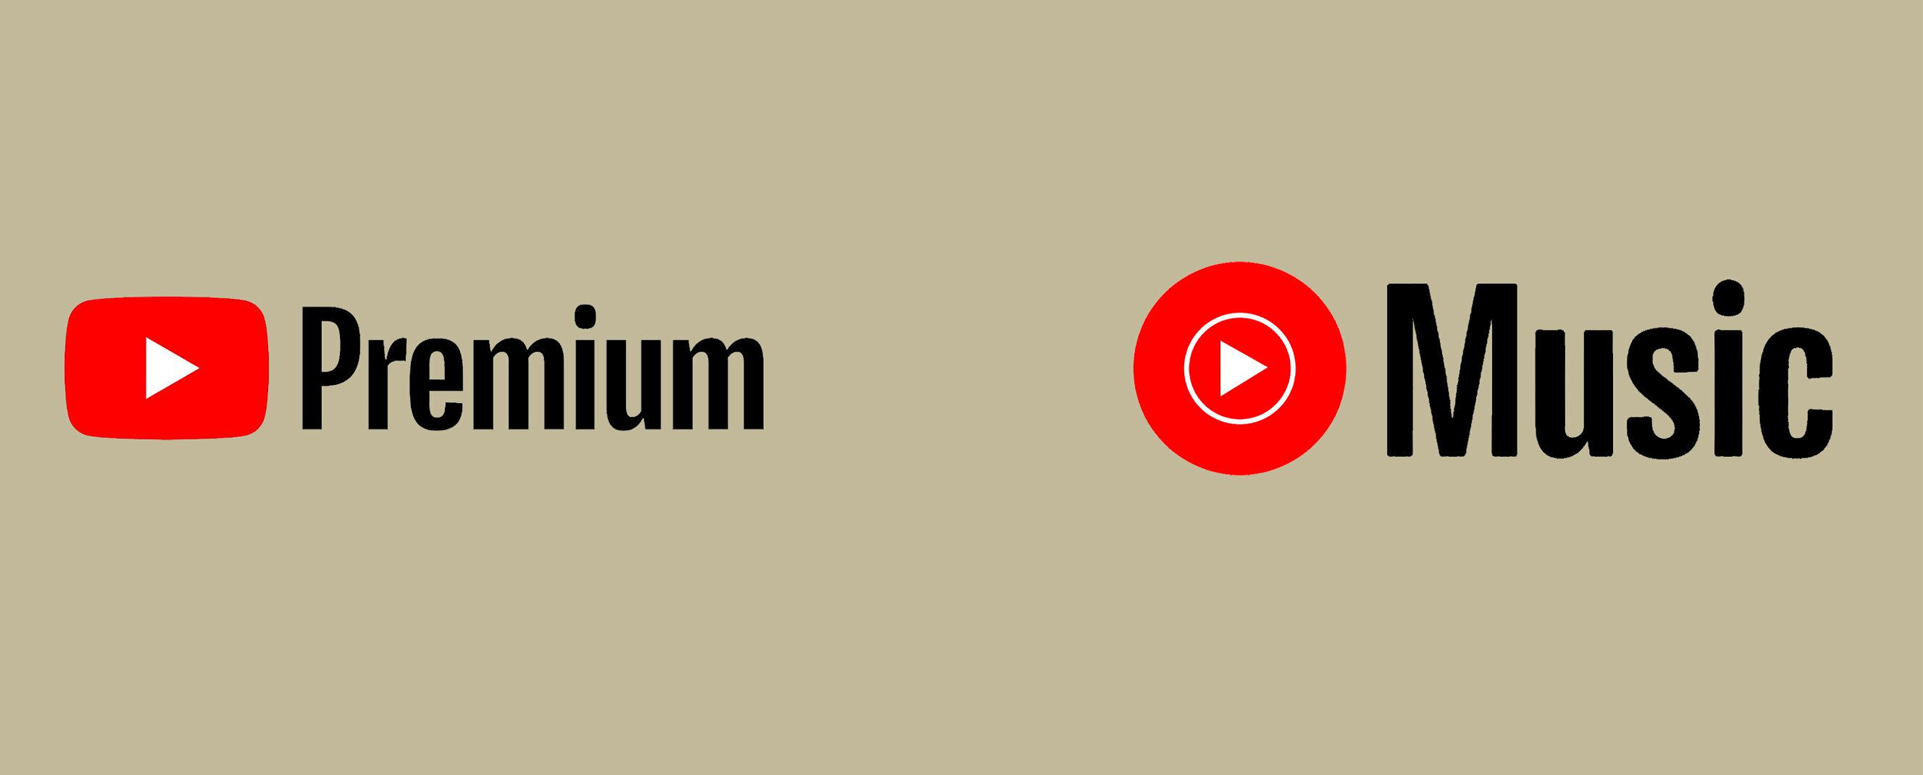 youtube-premium-e-music